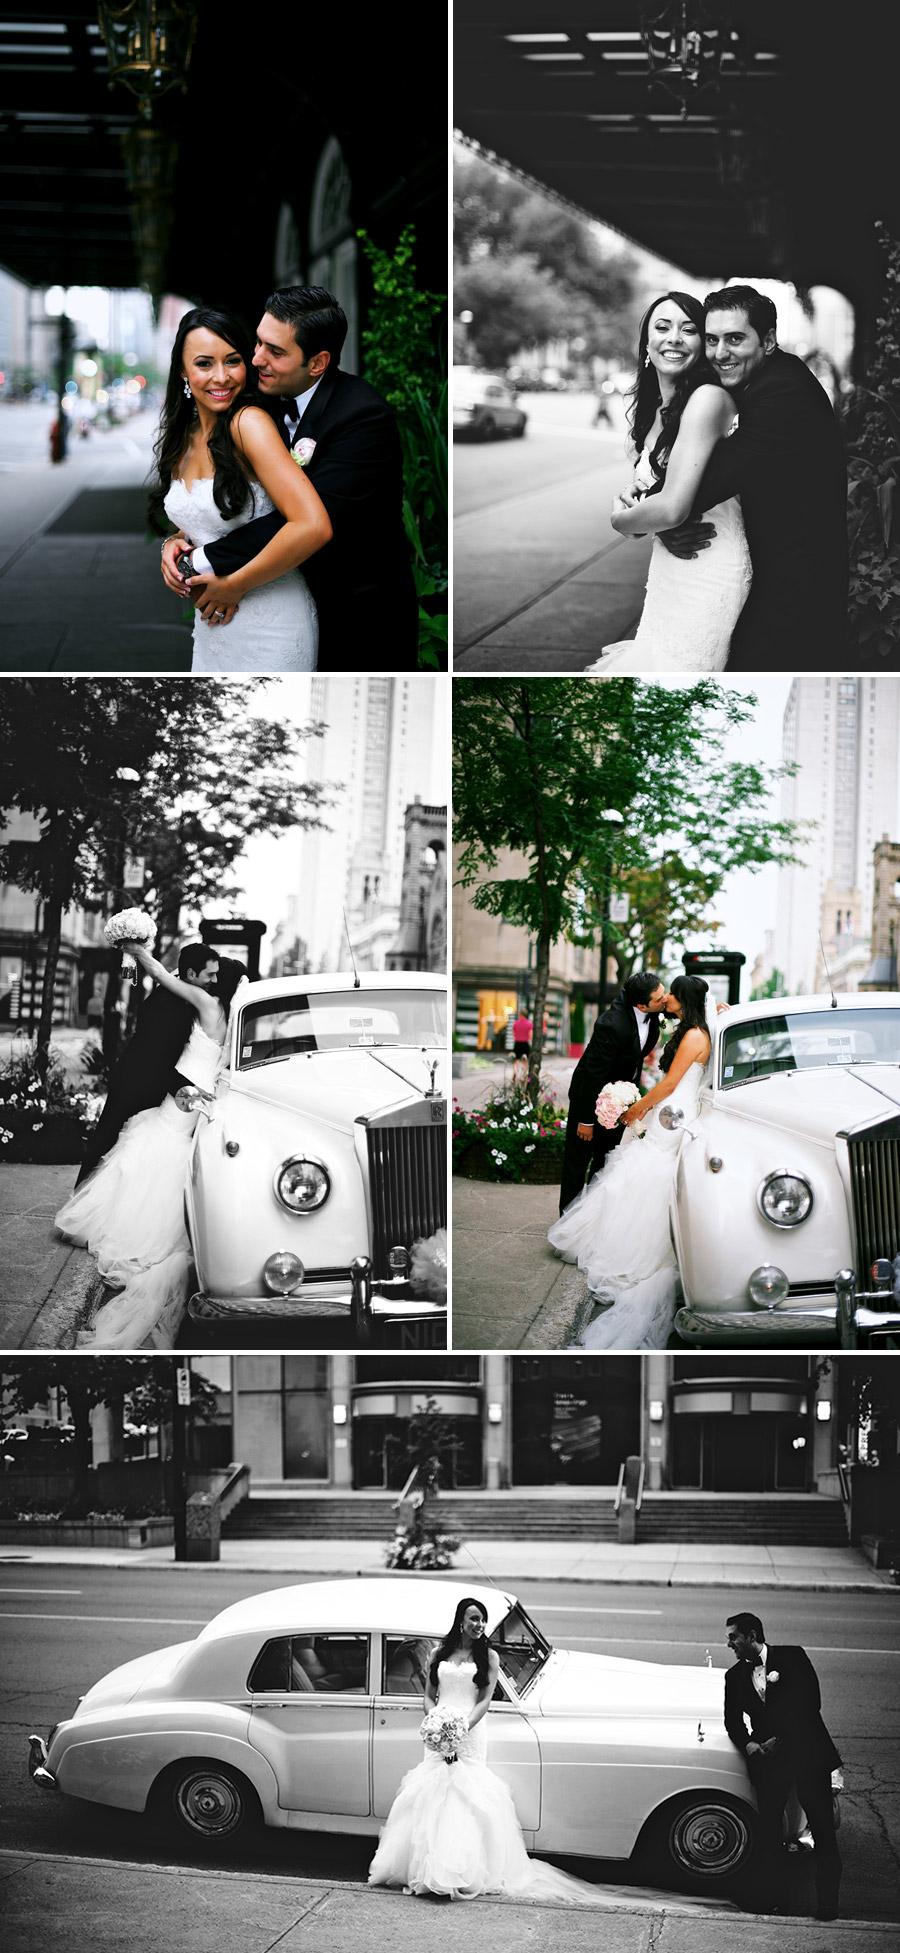 Blog-Collage-1409513602606.jpg